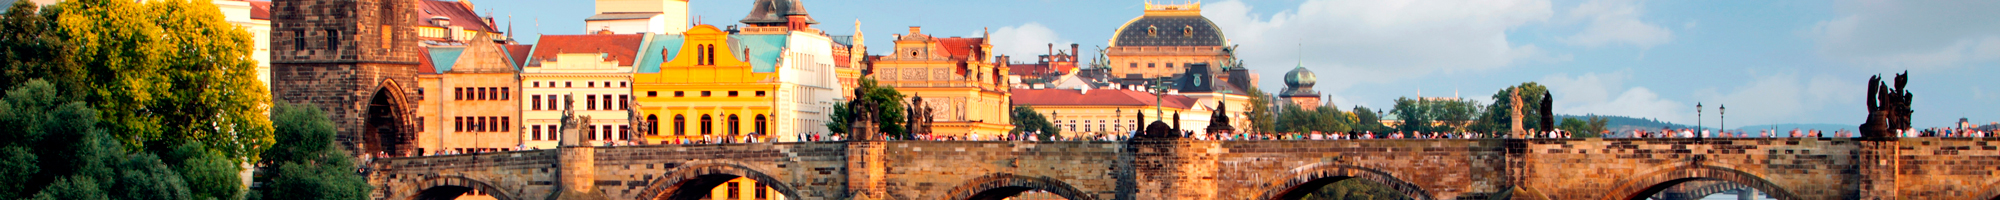 Hoteles con piscina cubierta en Praga